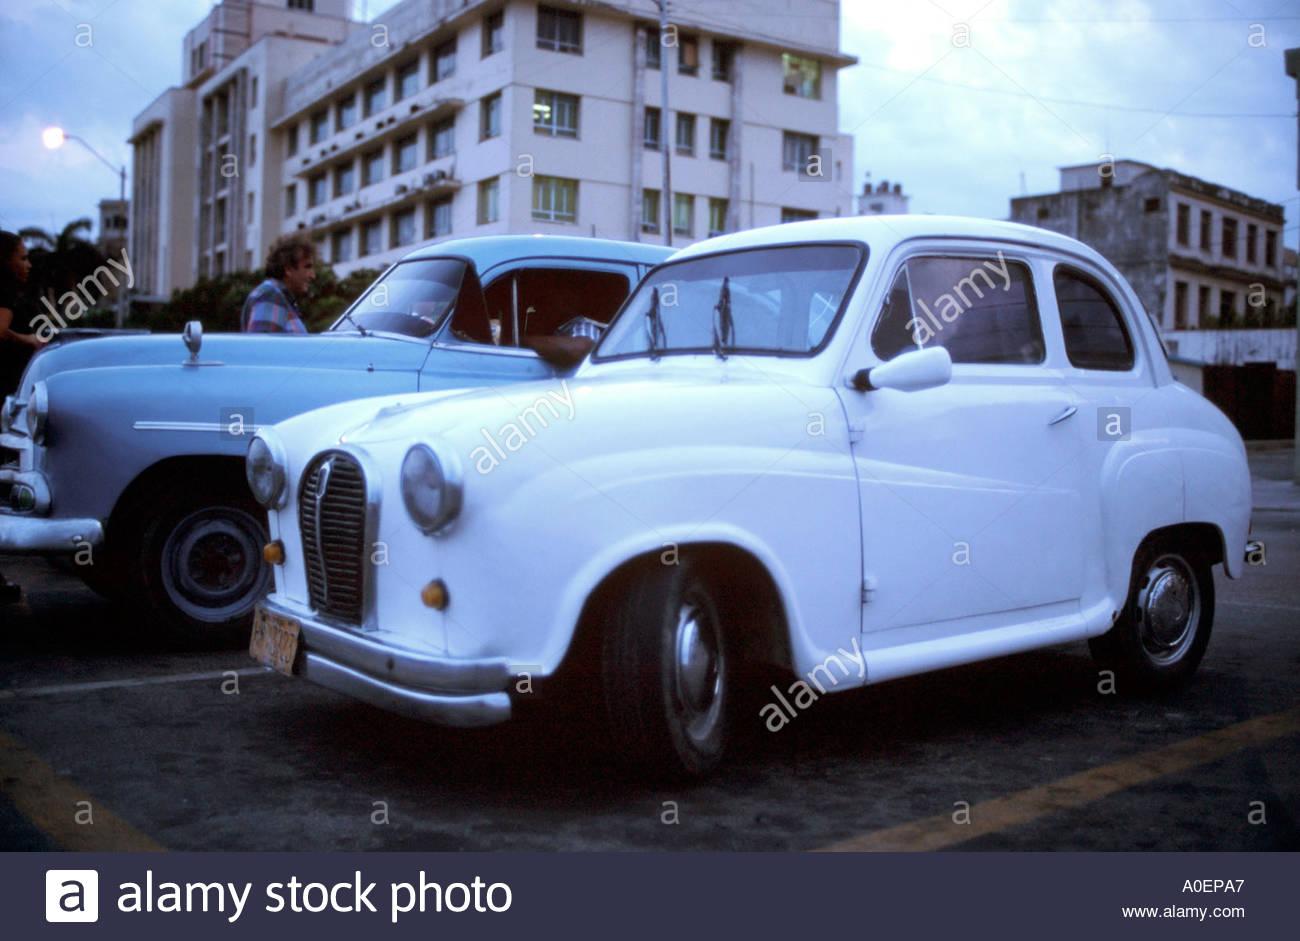 Austin classic cars, Havana, Cuba Stock Photo: 3255974 - Alamy